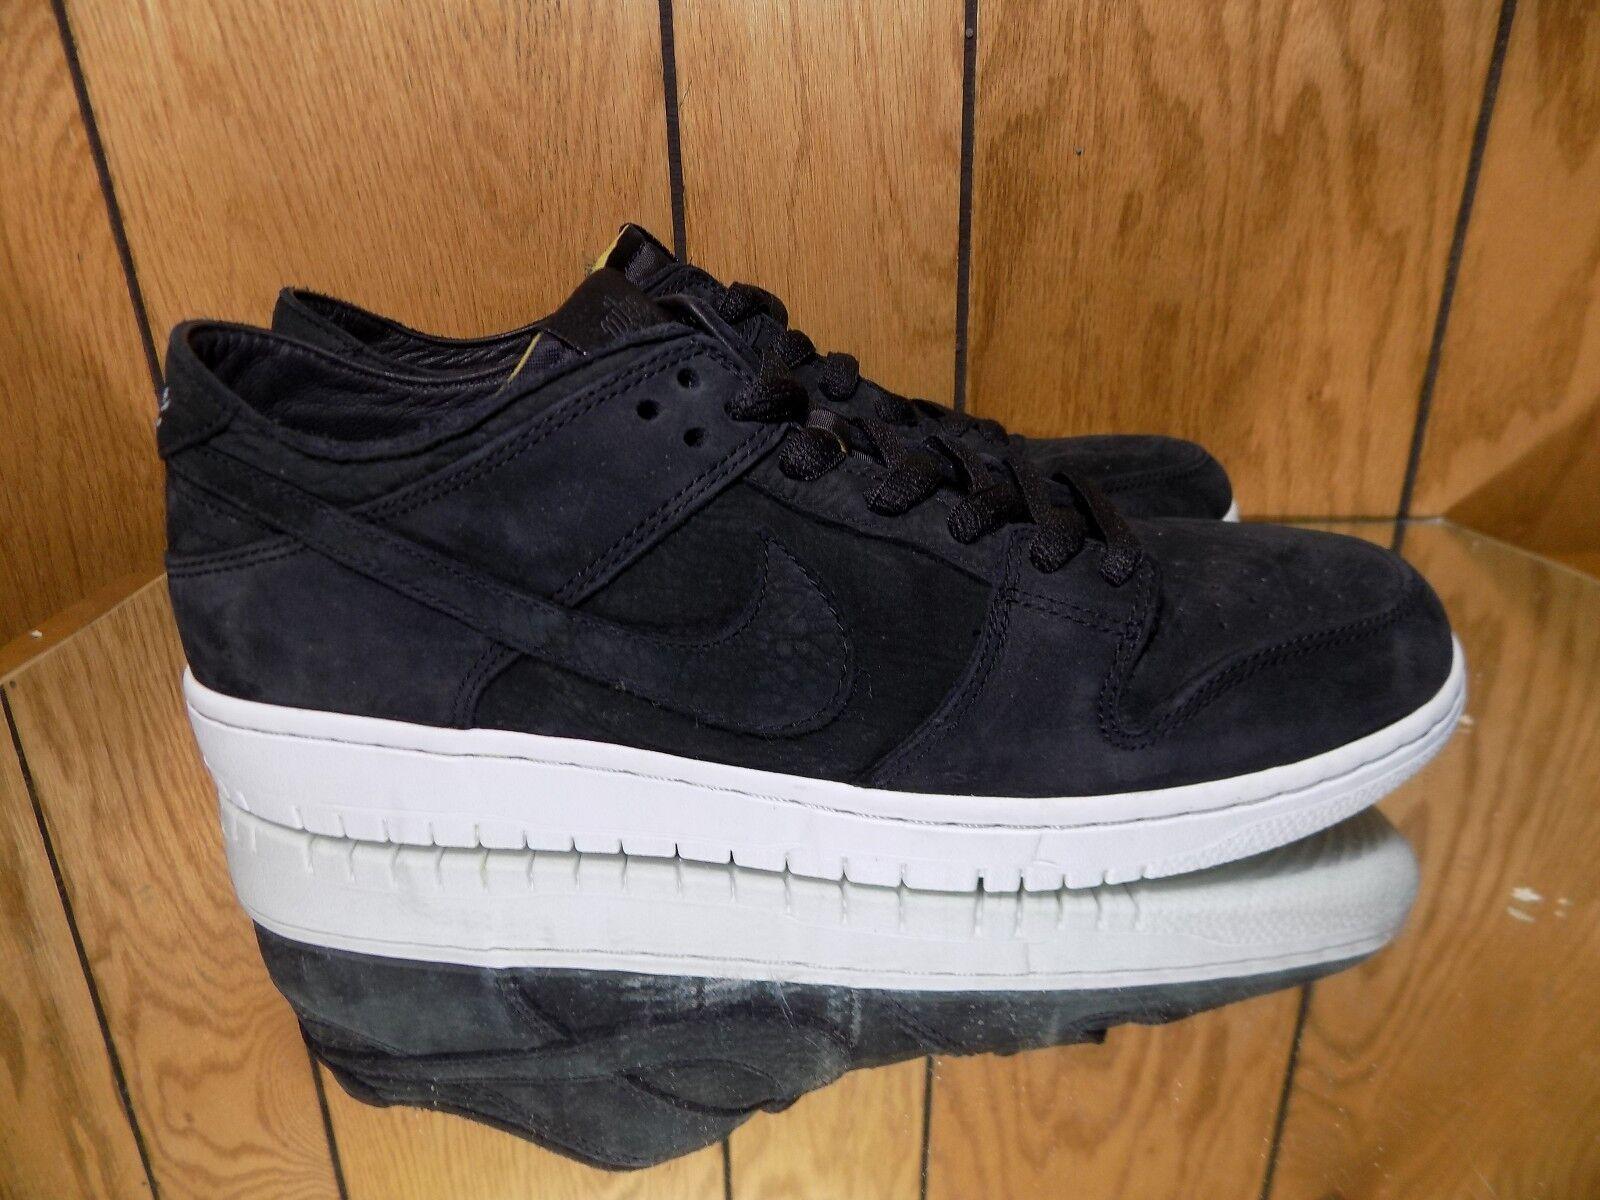 Nike SB Dunk Low Pro AA4275-002 Decon Black size 8.5 Premium